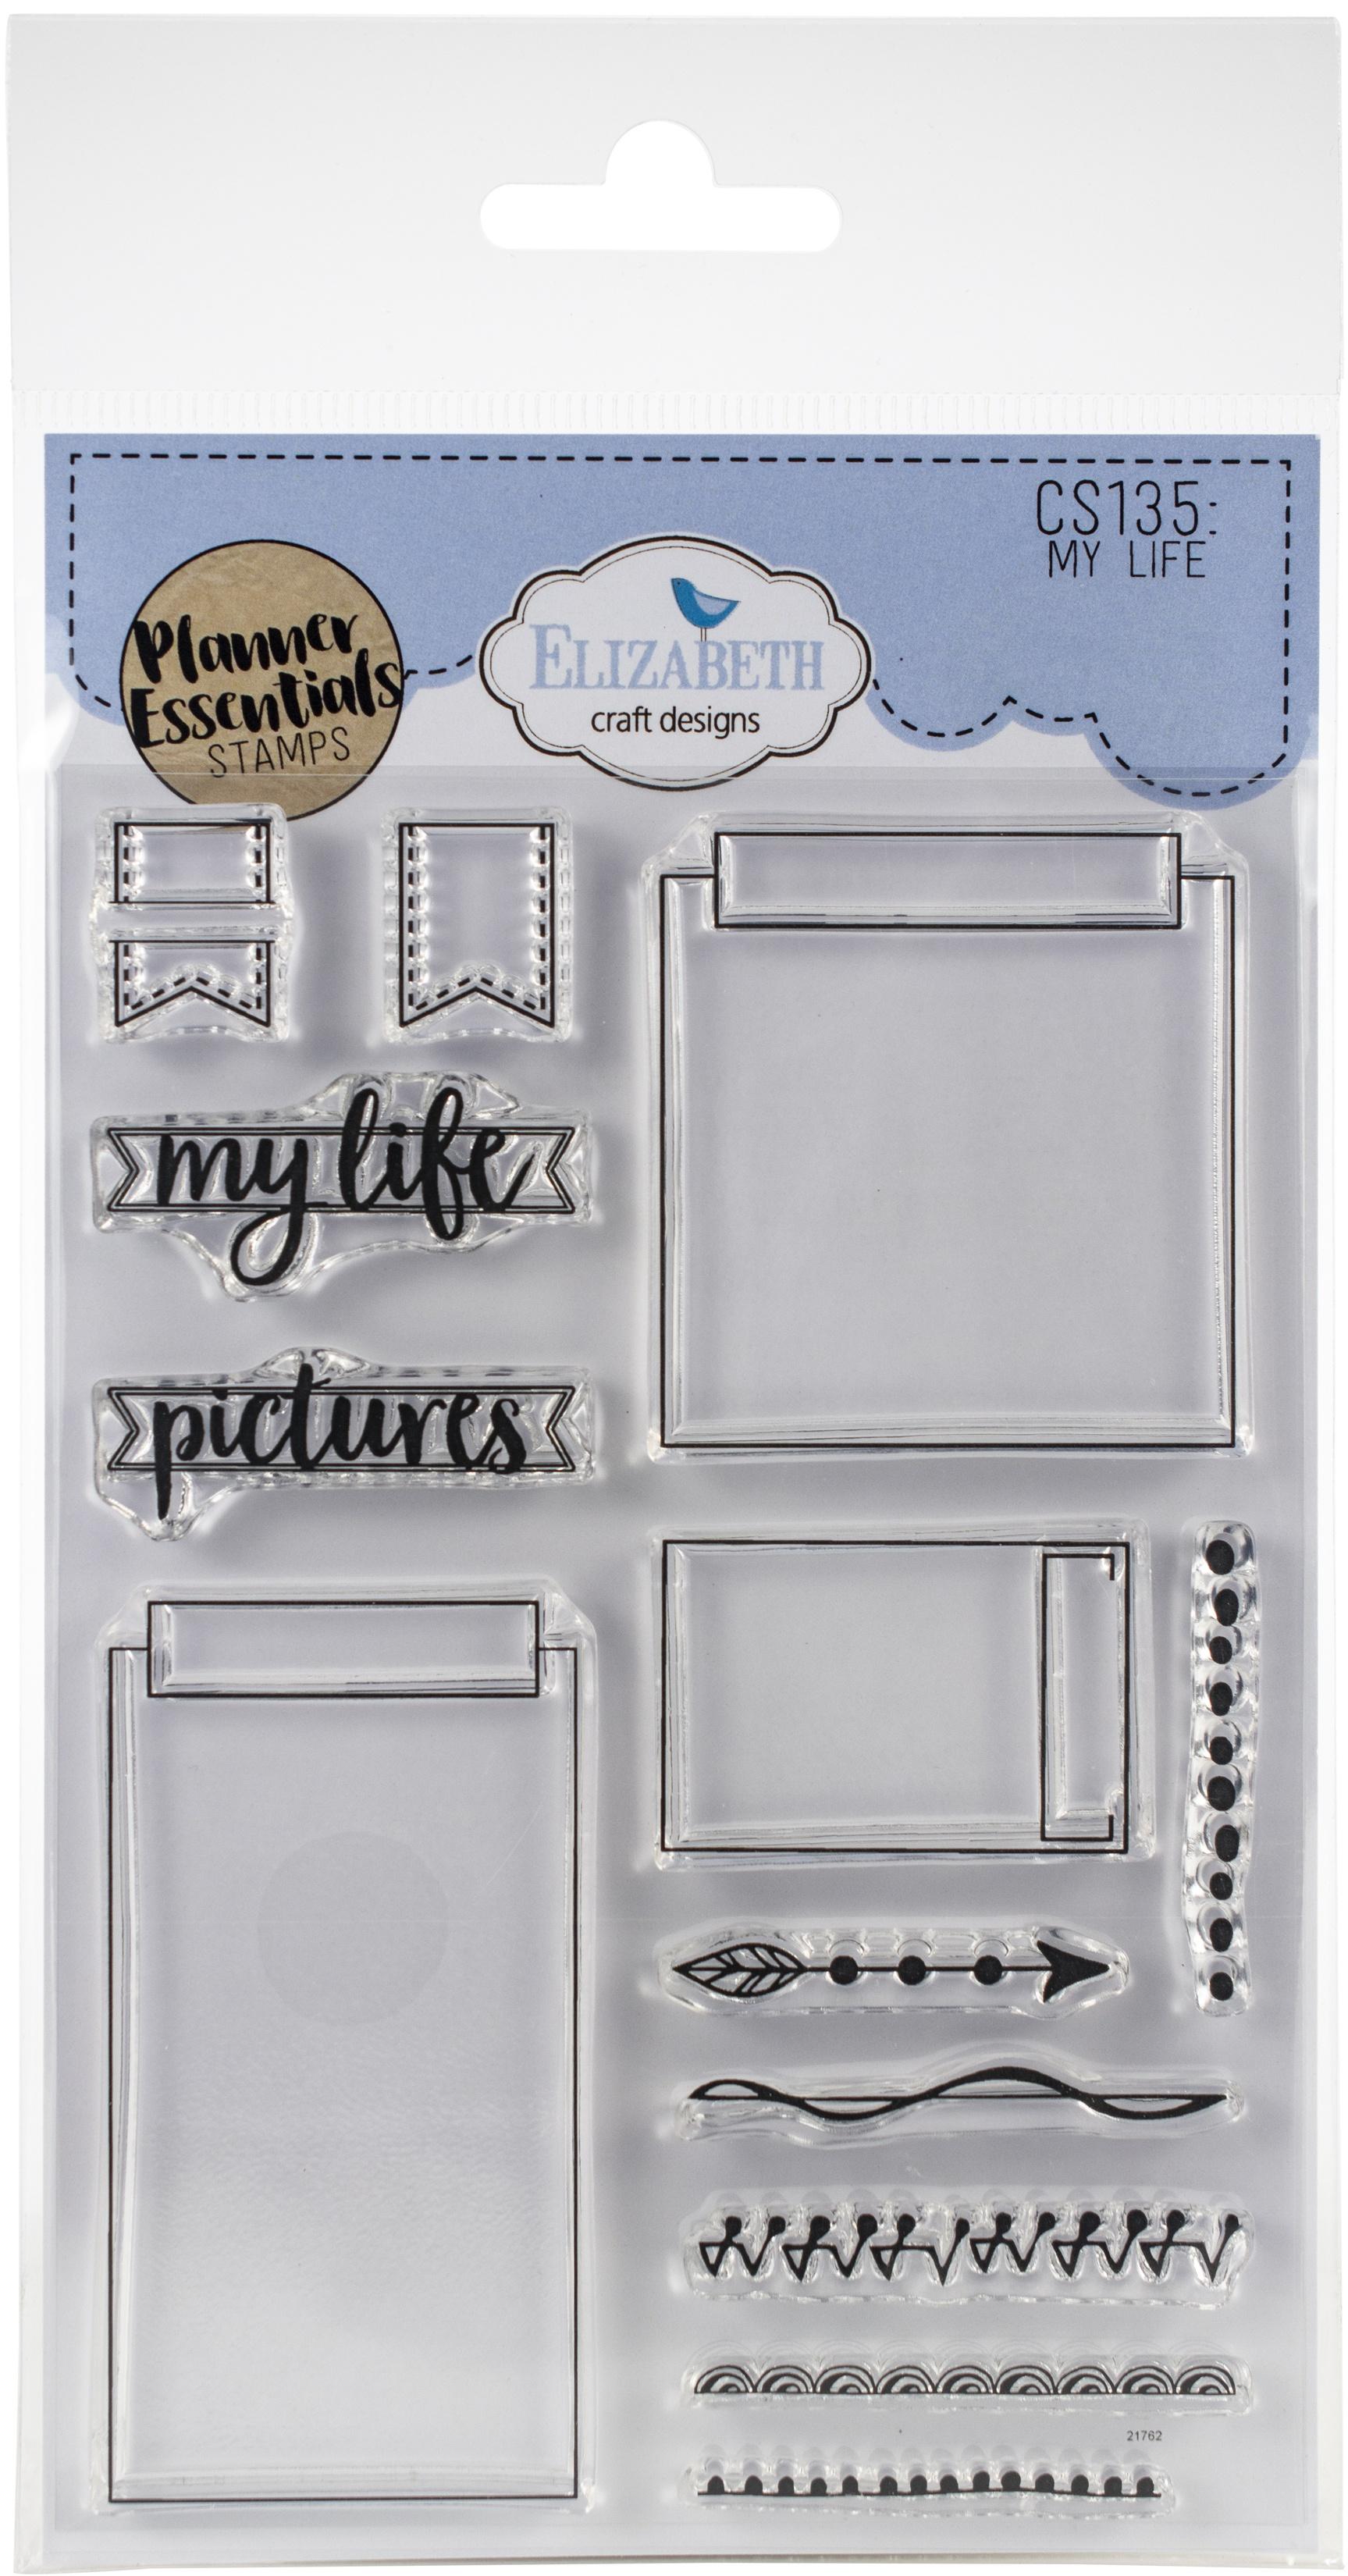 EC - My Life Stamp Set